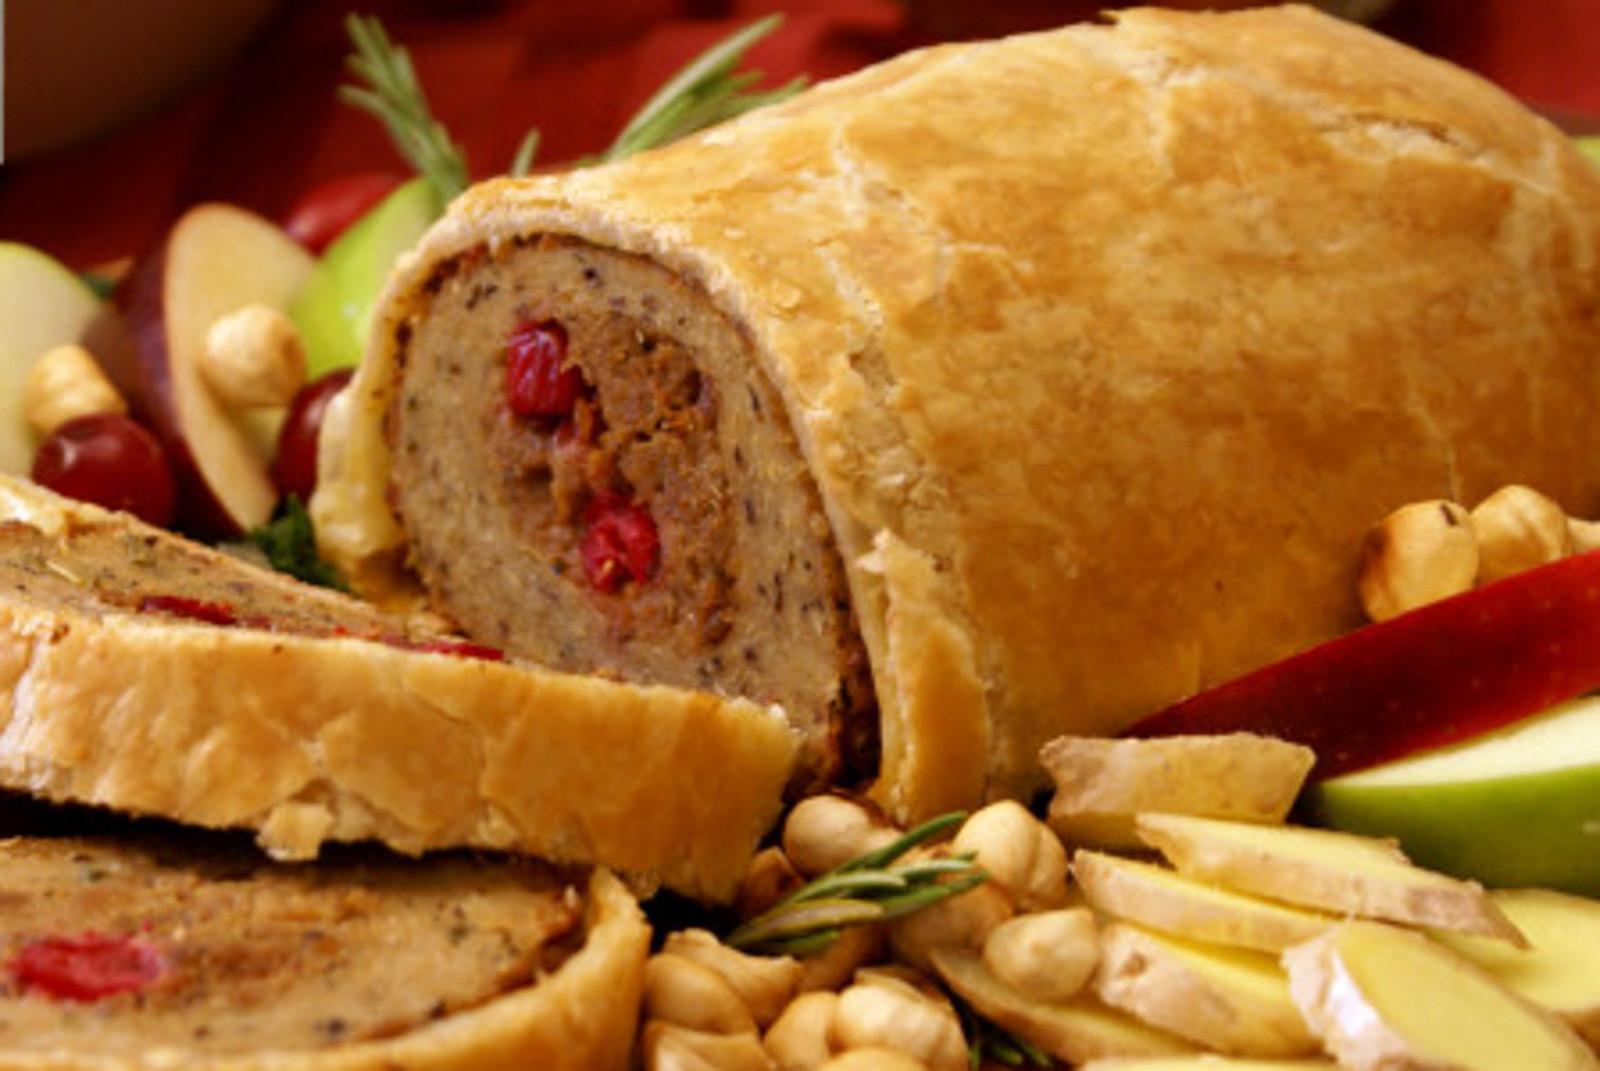 The Best Thanksgiving Turkey  The Best Meatless Turkey Alternatives for Thanksgiving